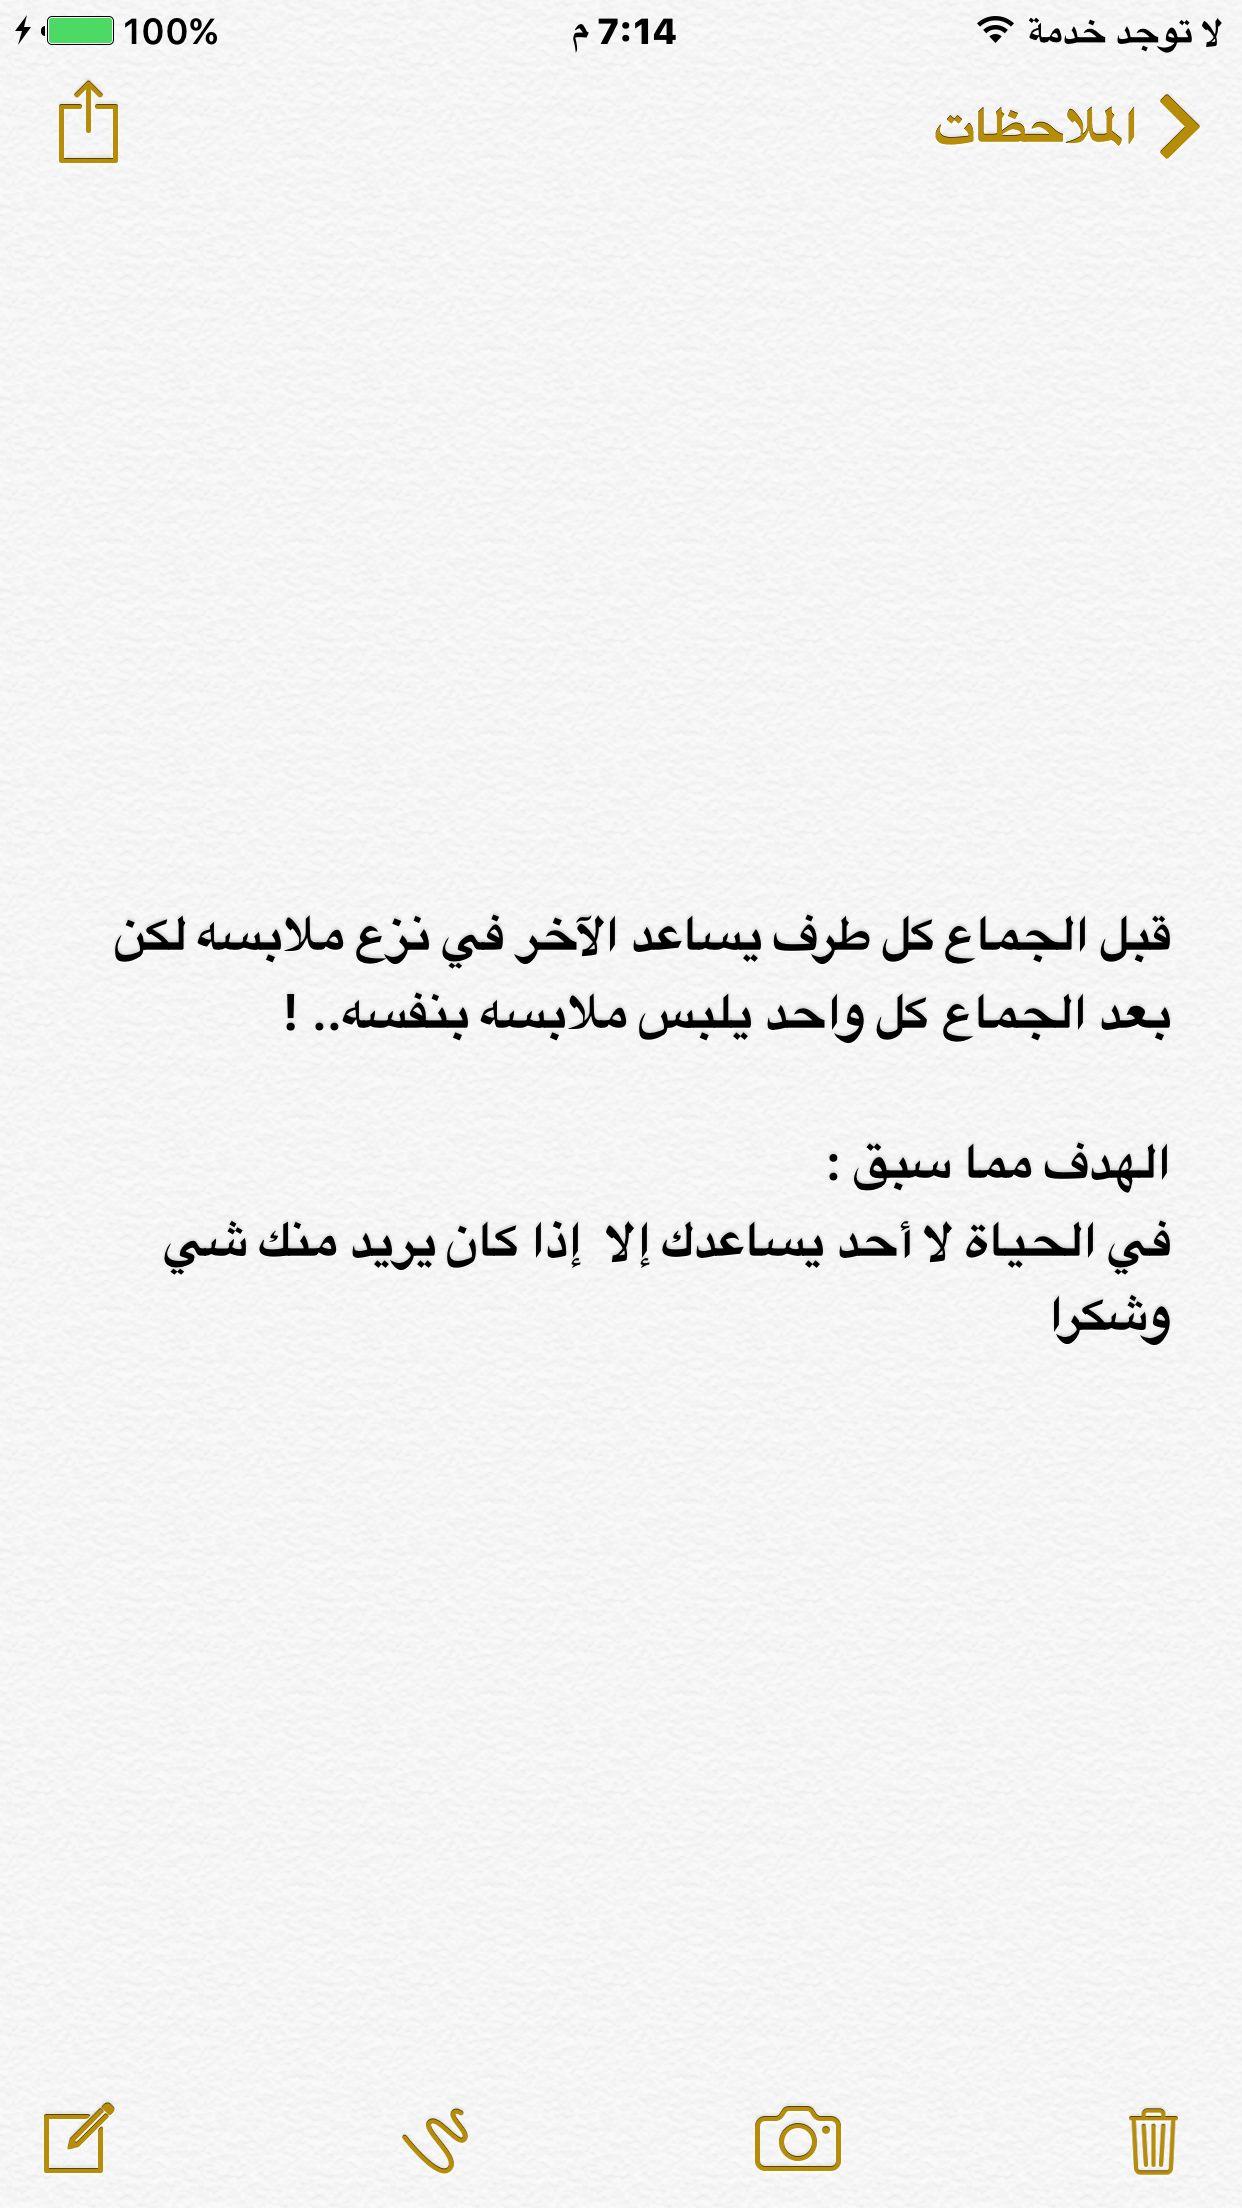 كلام قلة ادب بس واقعي وفيه حكمة Funny Arabic Quotes Cool Words Beautiful Words